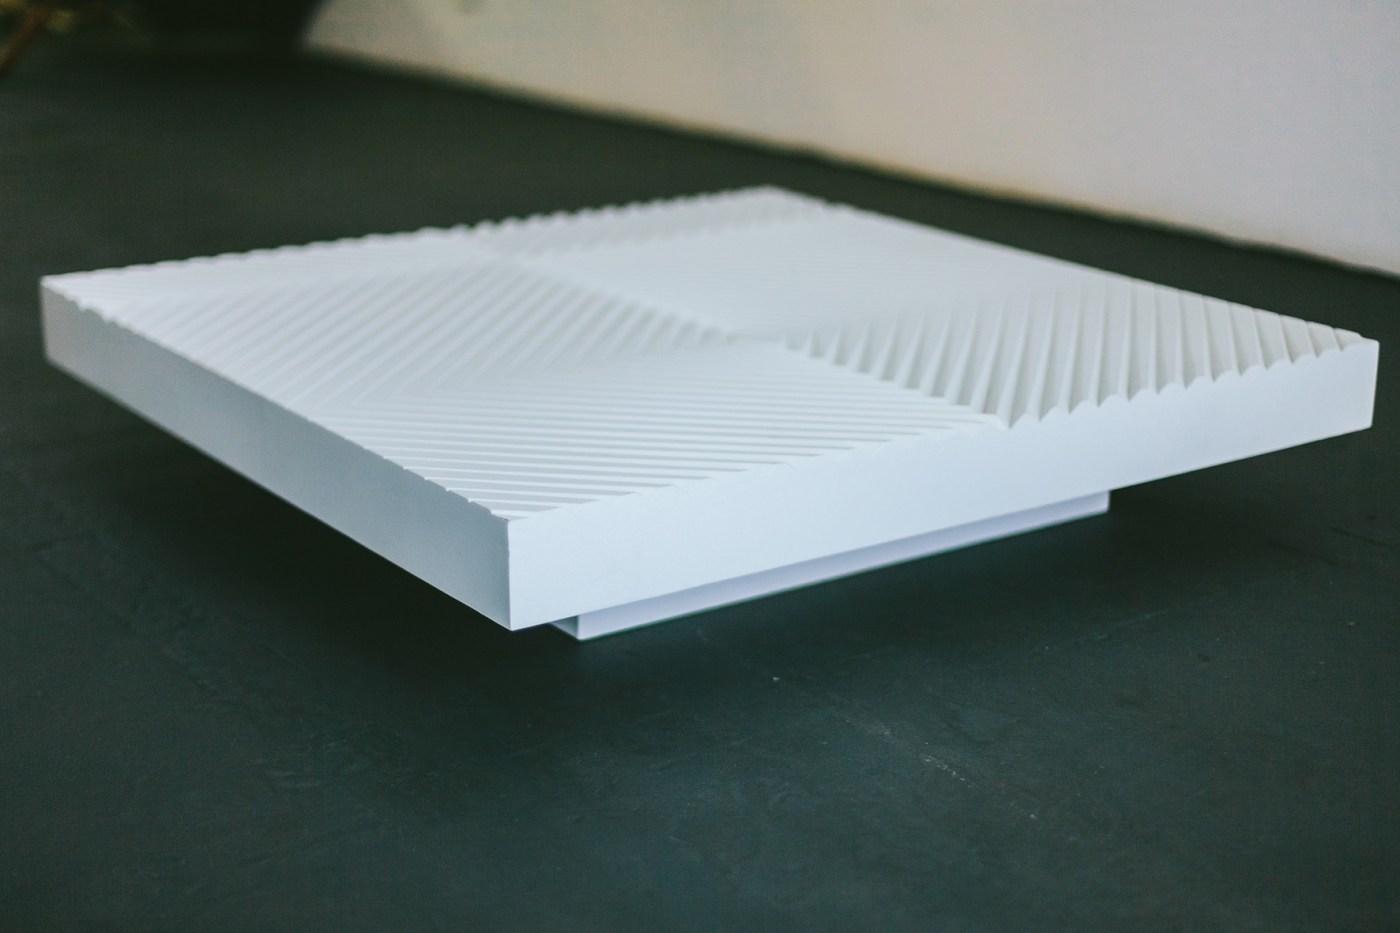 Nolli design - andrea macruz -Boobam 7